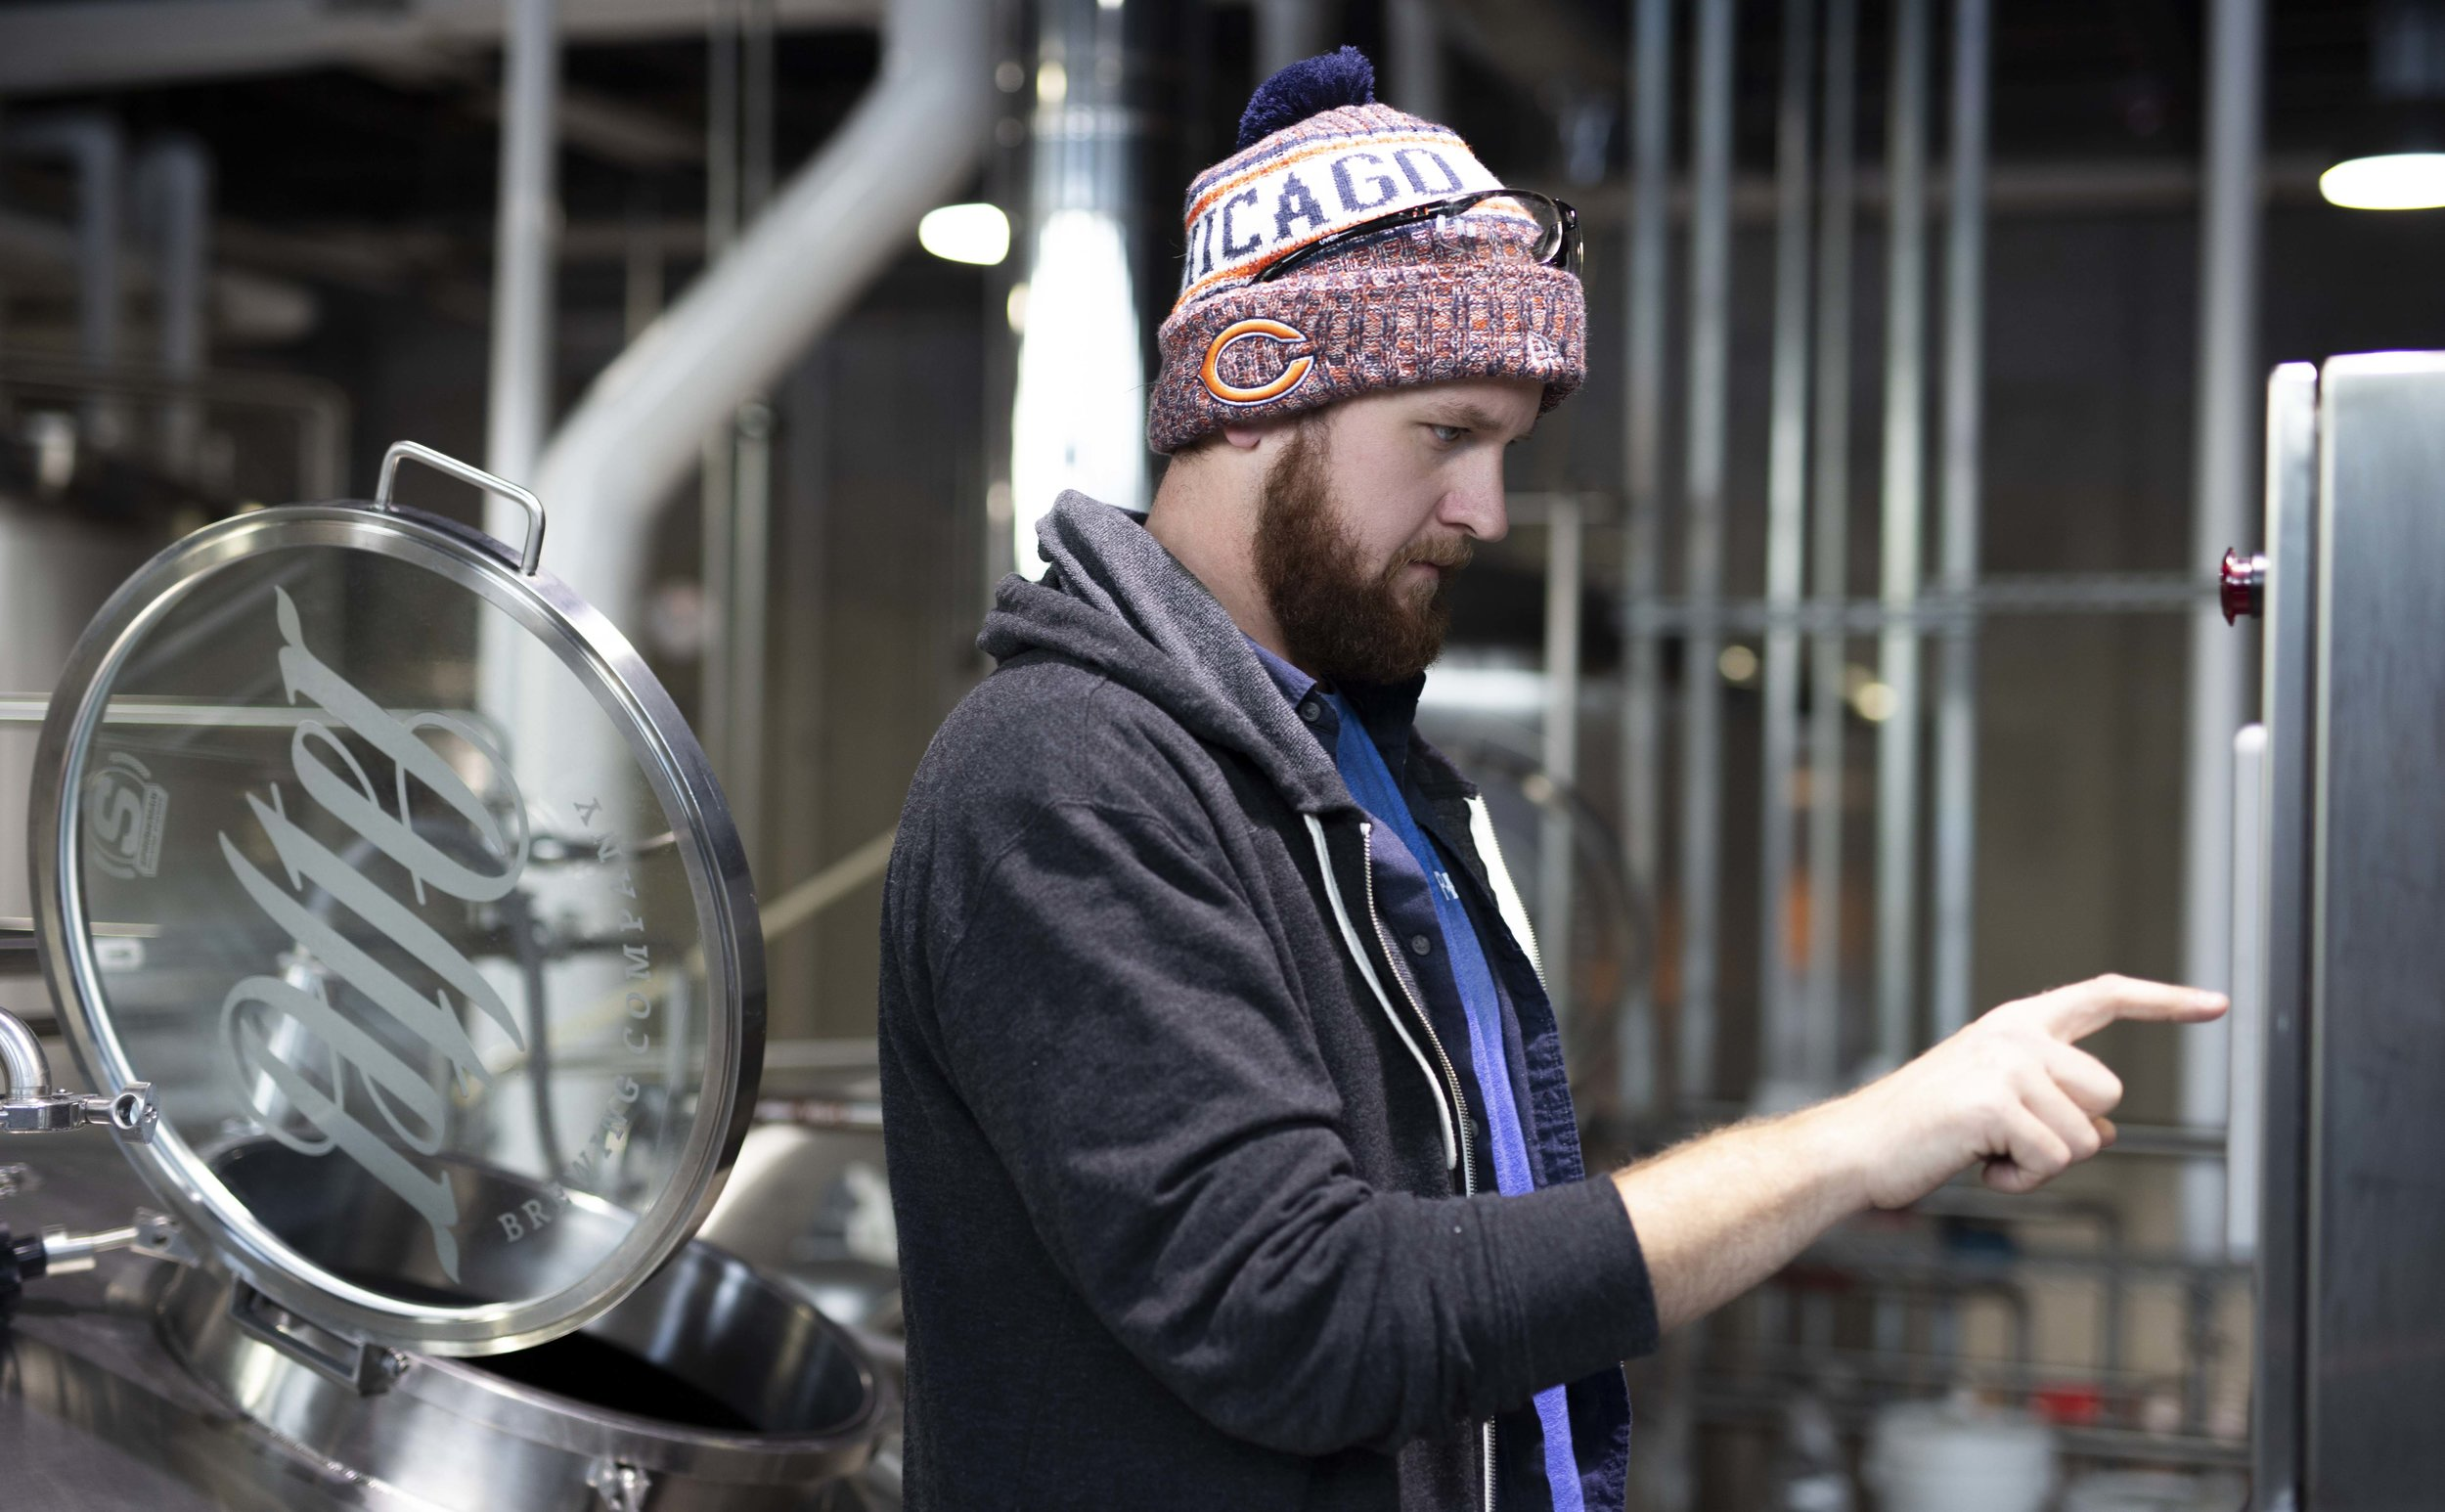 Head Brewer Matt McCowan dials in a recipe in the brewhouse.